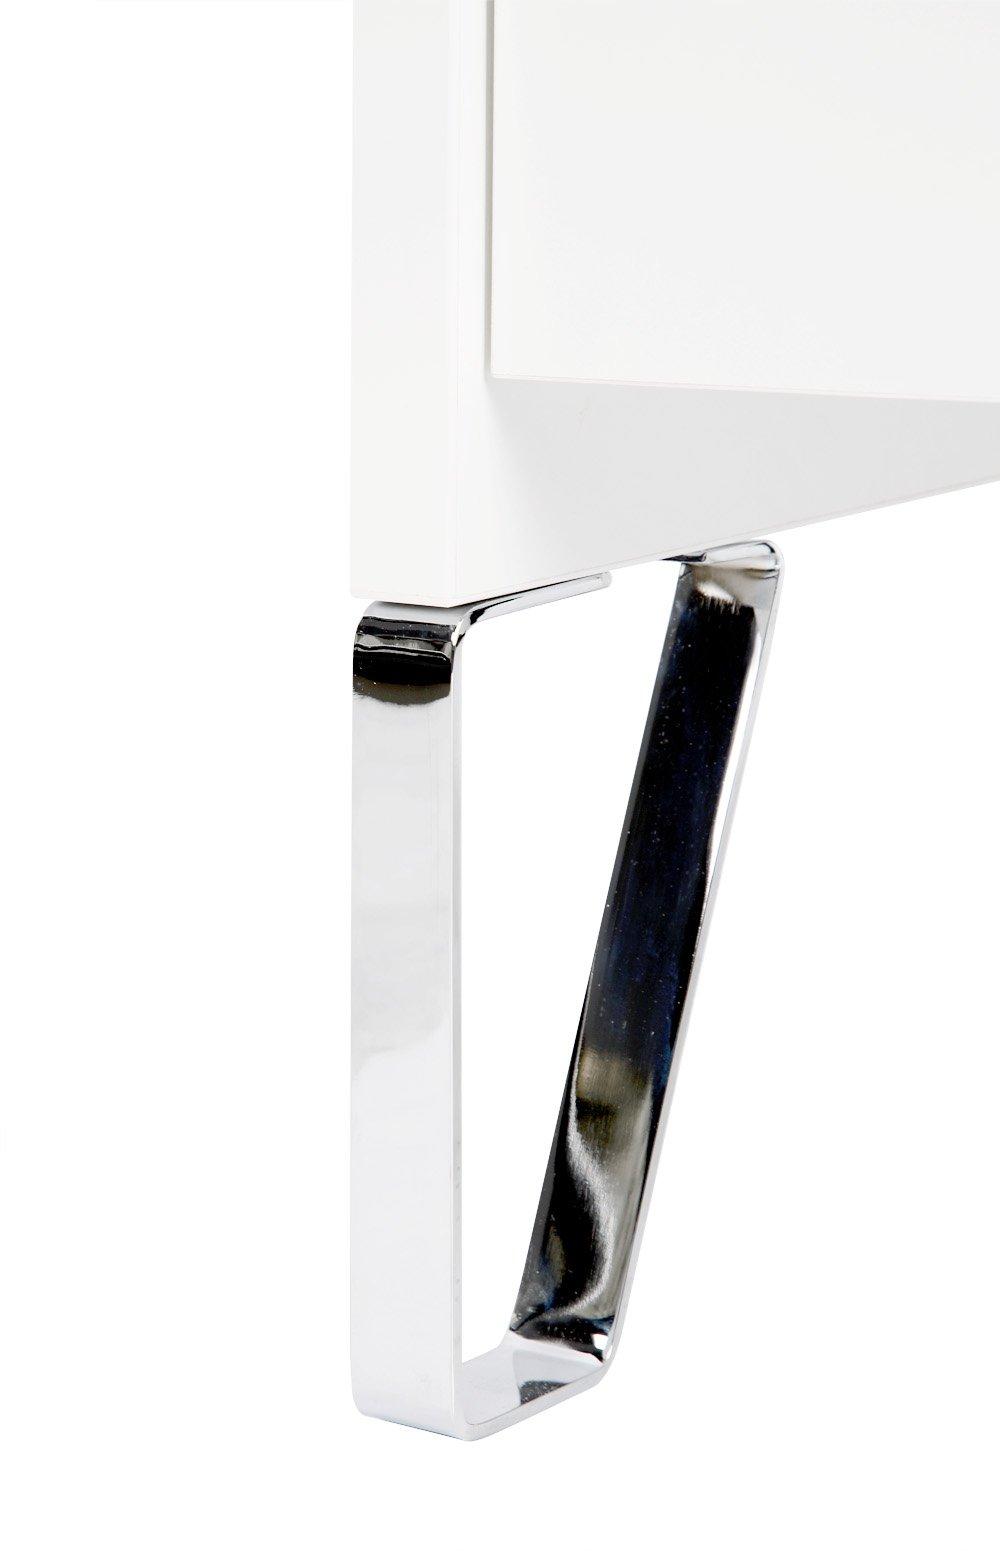 Dìtská postýlka Blanka 120x60 cm bílá - zvìtšit obrázek